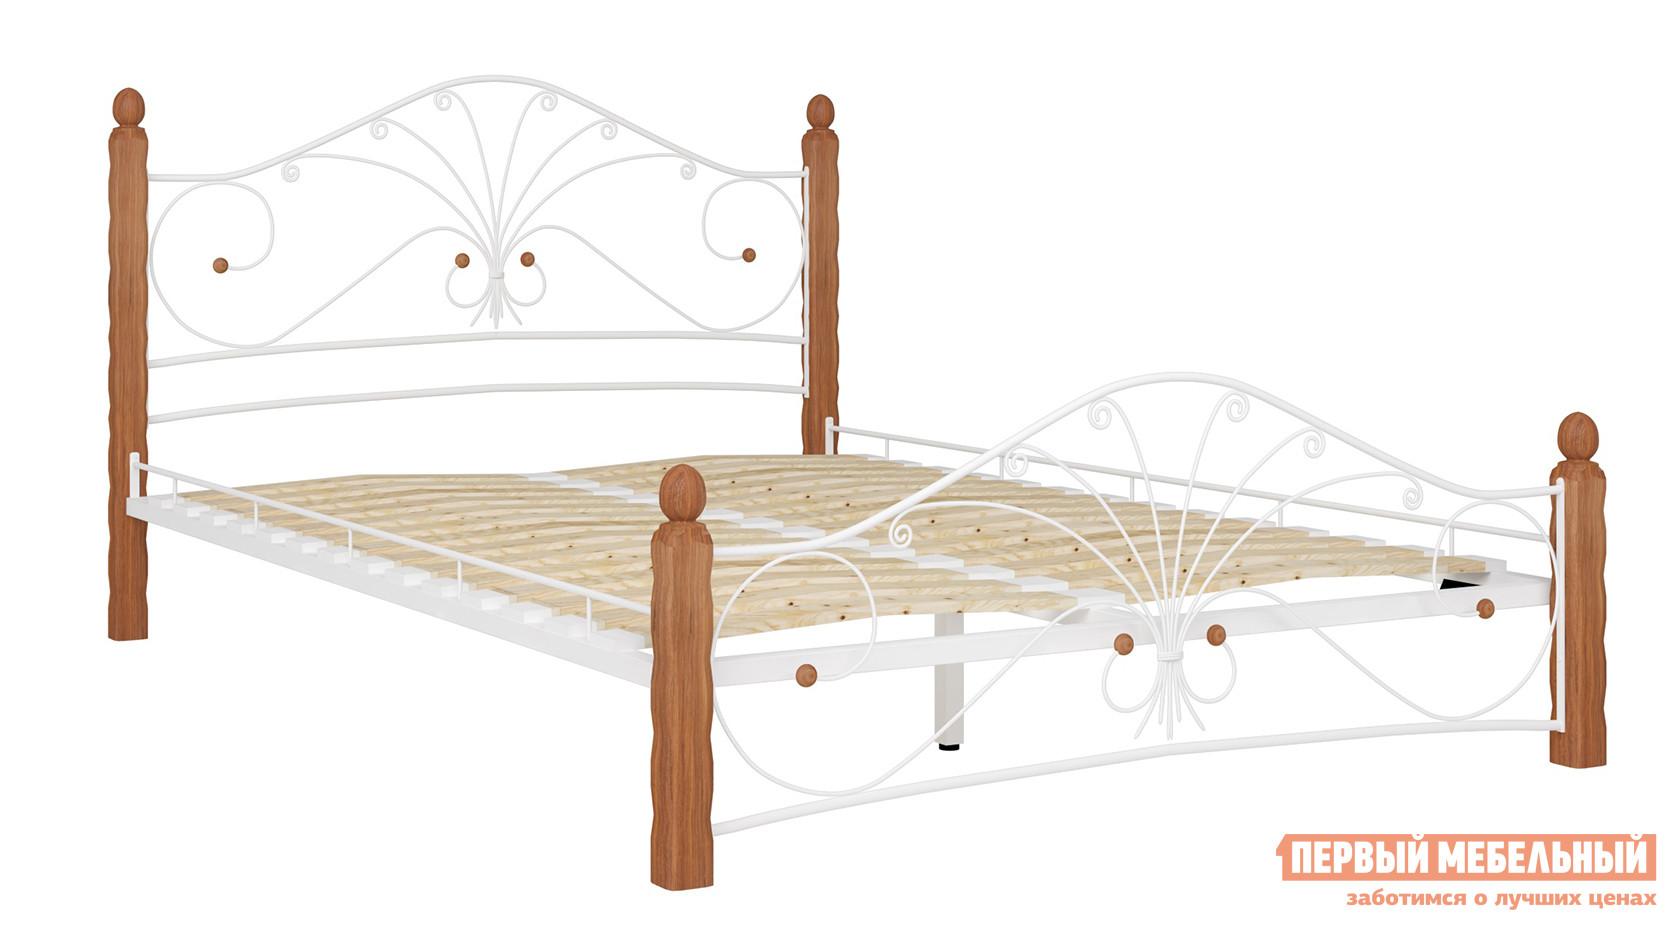 Двуспальная кровать  Сандра Белый металл, каркас / Махагон массив, опоры, 1600 Х 2000 мм Форвард-мебель 75803